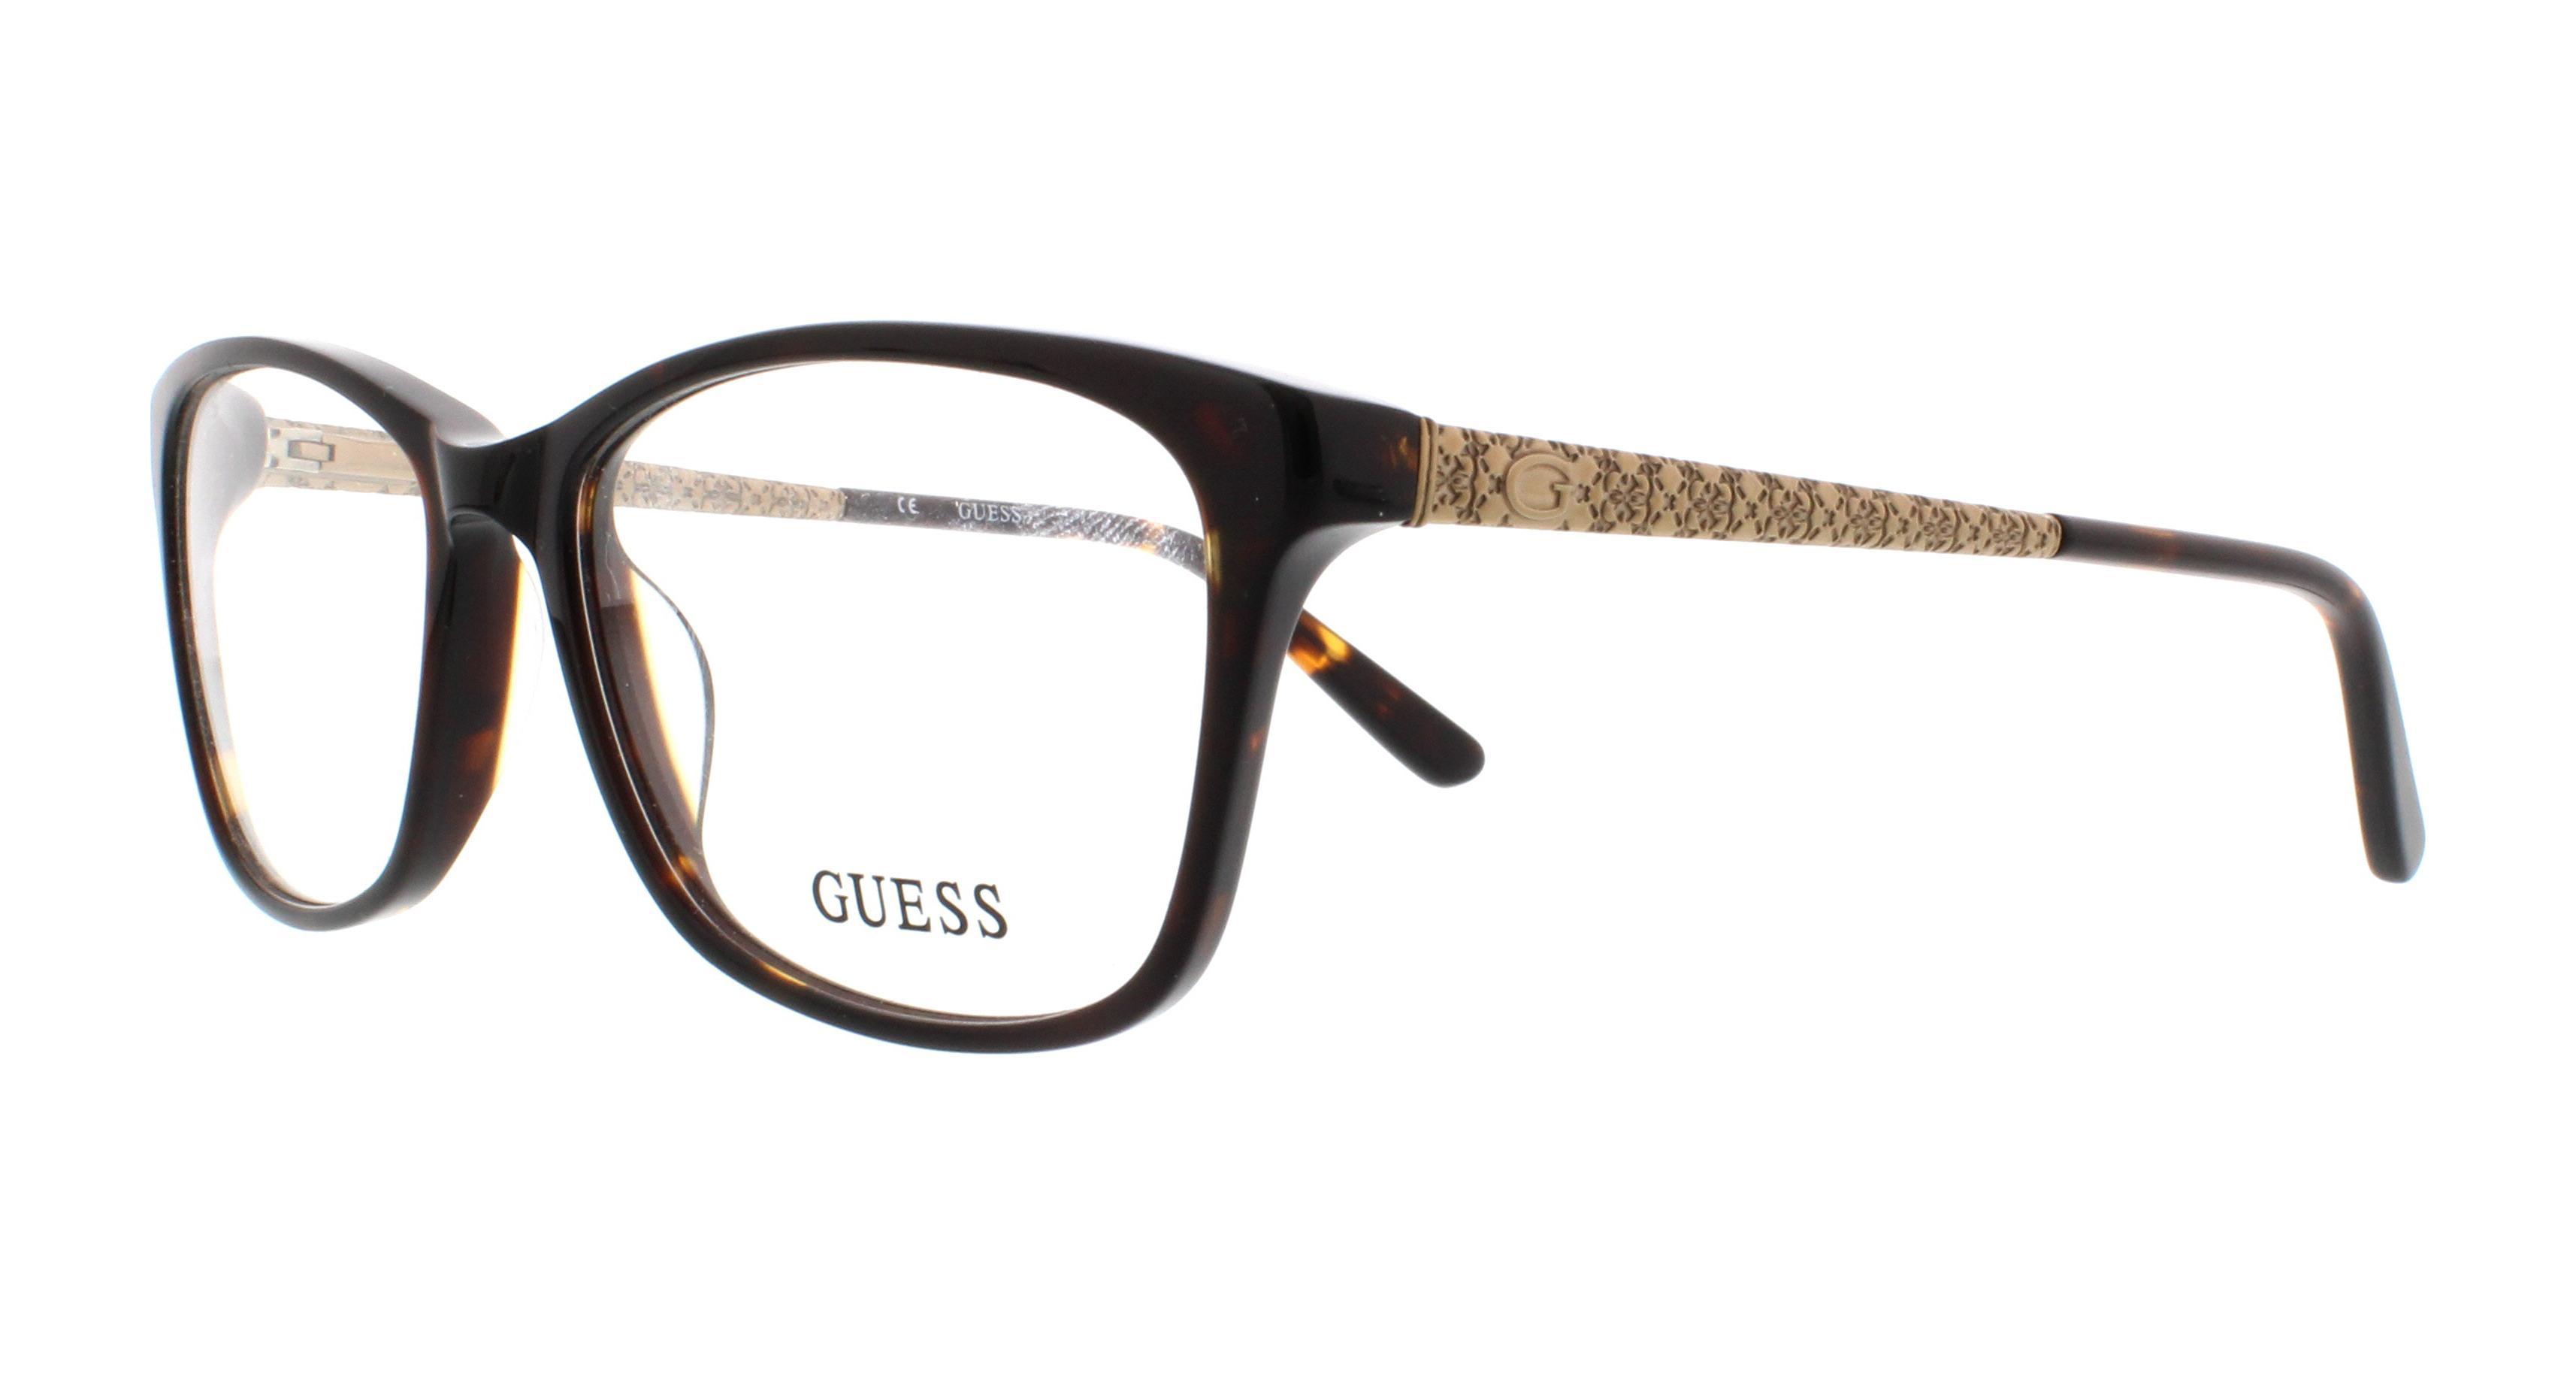 df753626392 Guess Womens Glasses - Best Glasses Cnapracticetesting.Com 2018